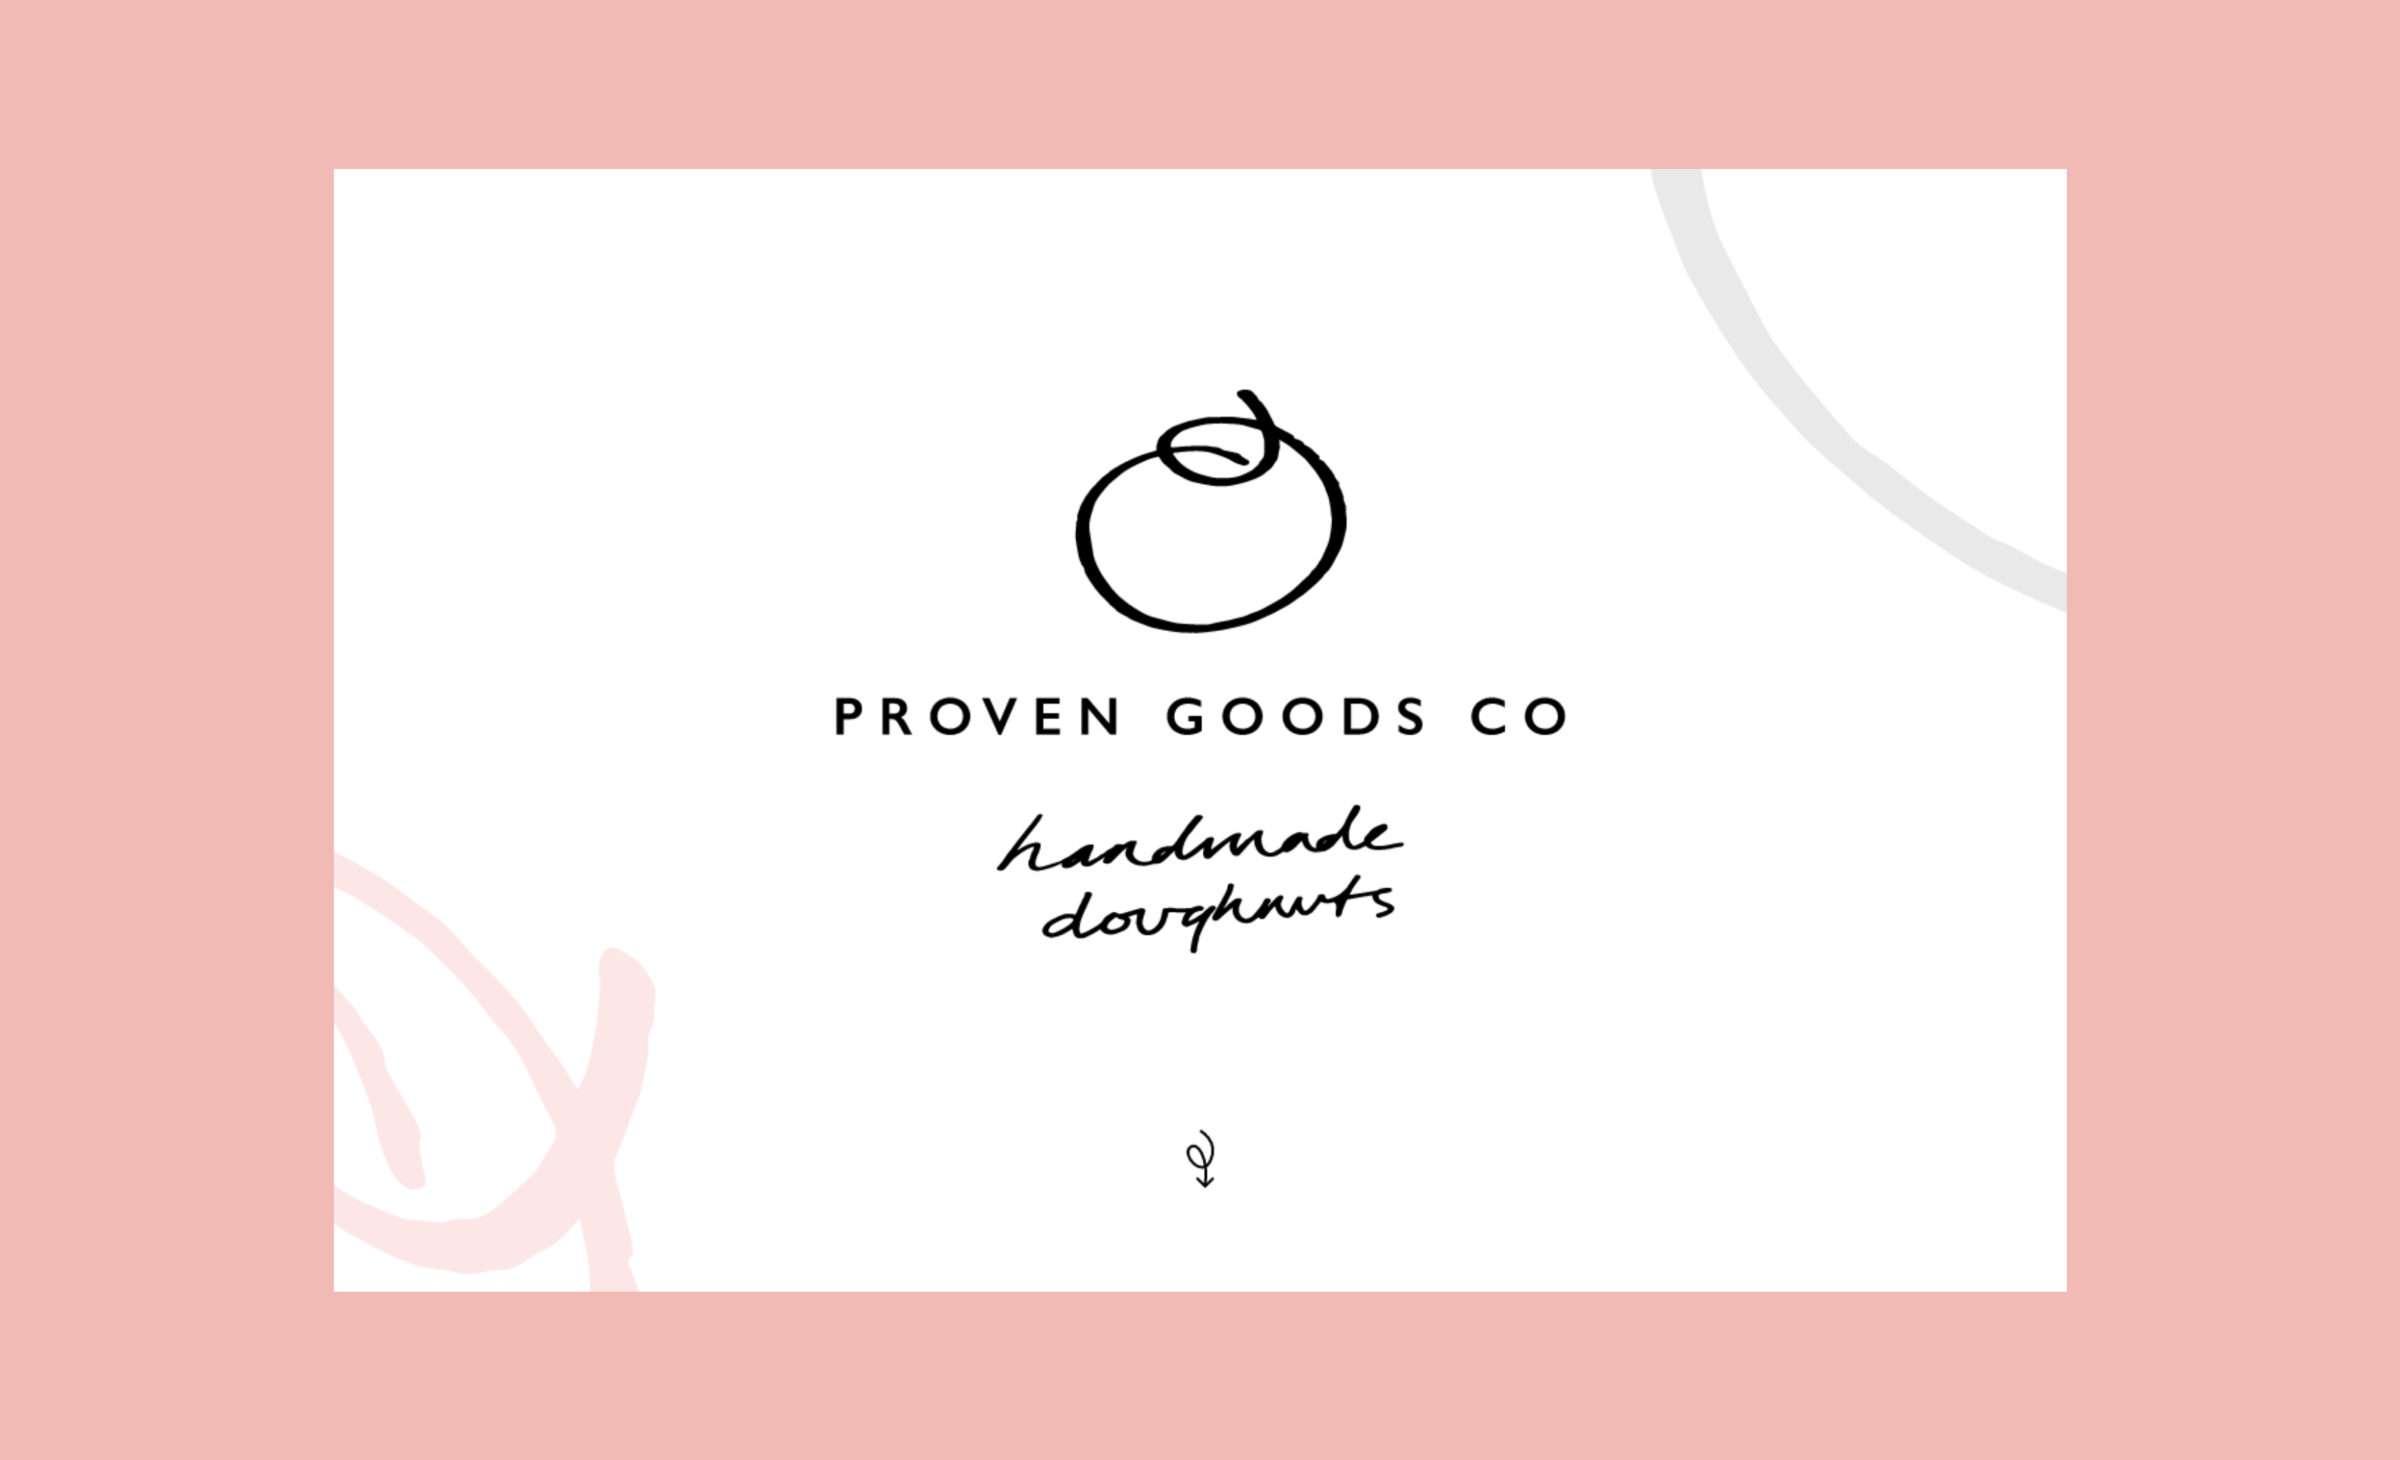 The Proven Goods website